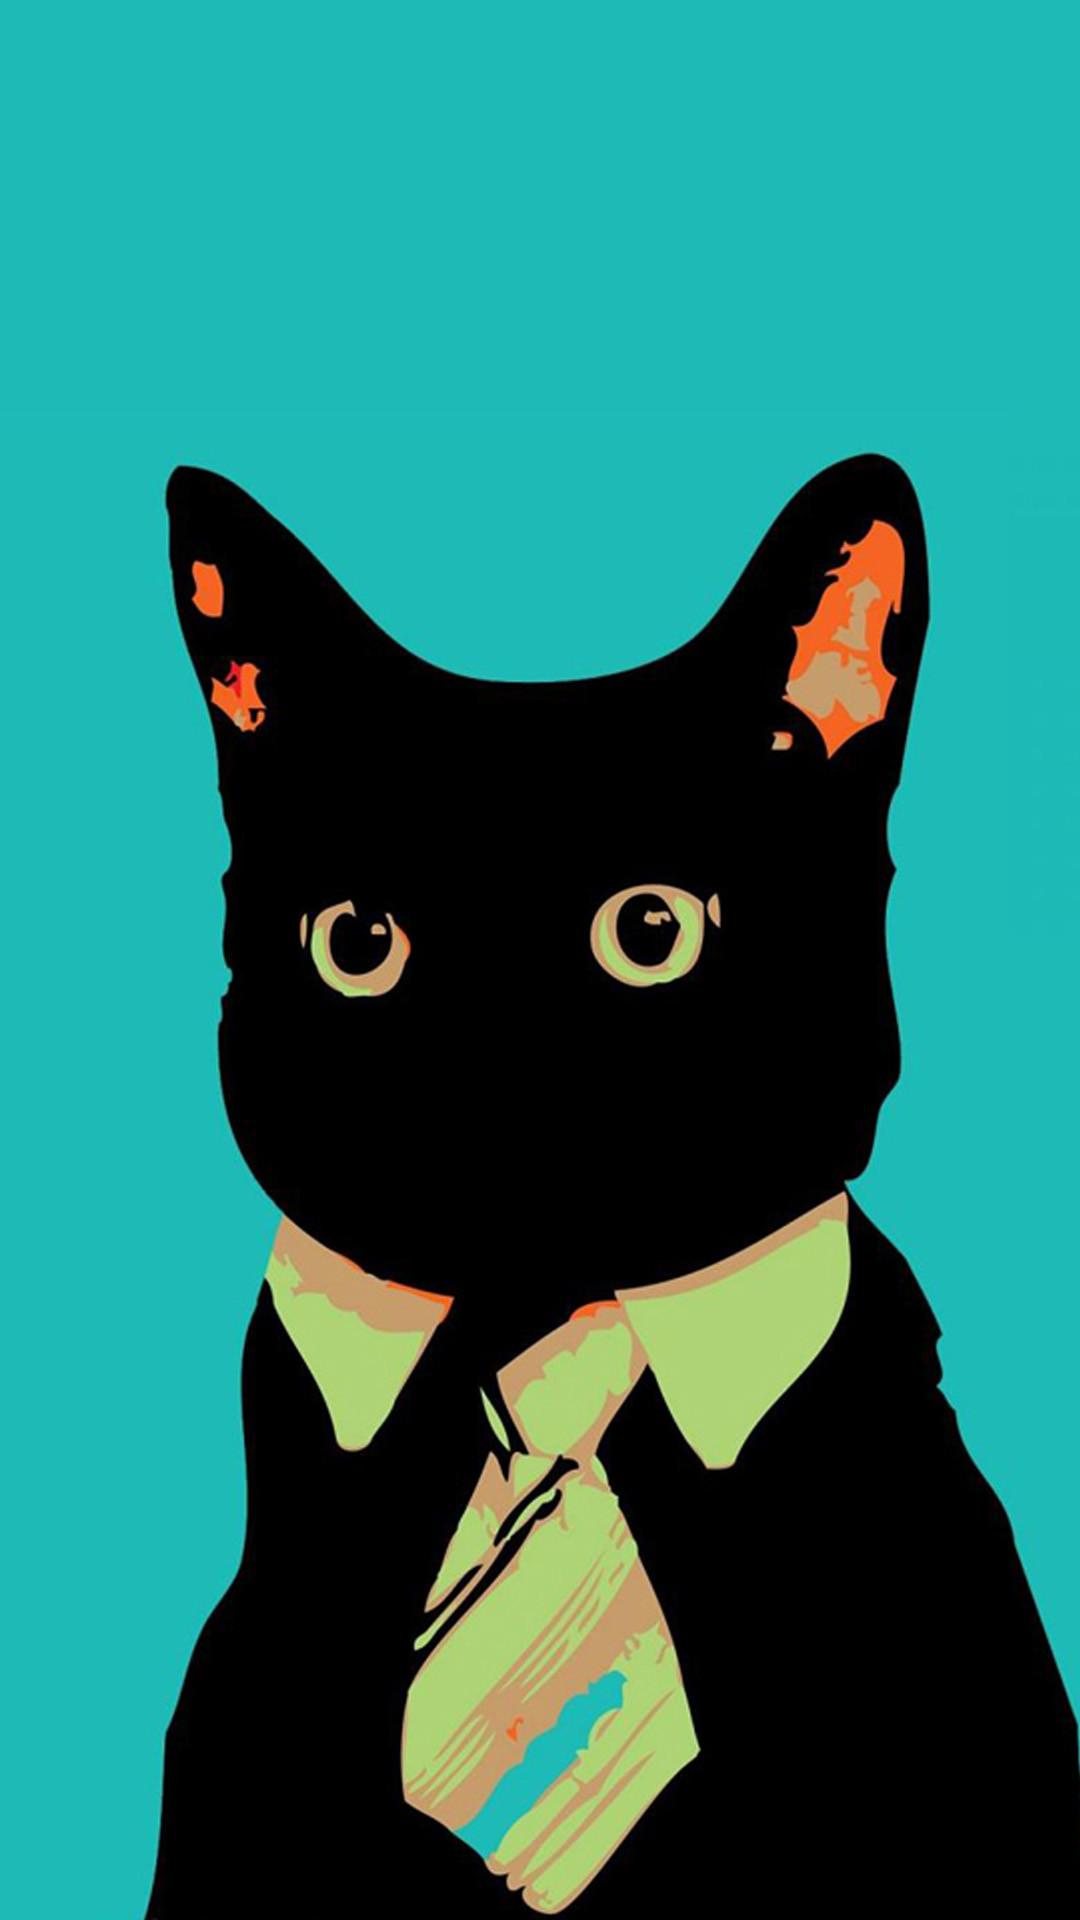 Funny Iphone Wallpaper Ios 7 Funny Iphone Lock Screen Cat In Suit Cartoon 1080x1920 Download Hd Wallpaper Wallpapertip